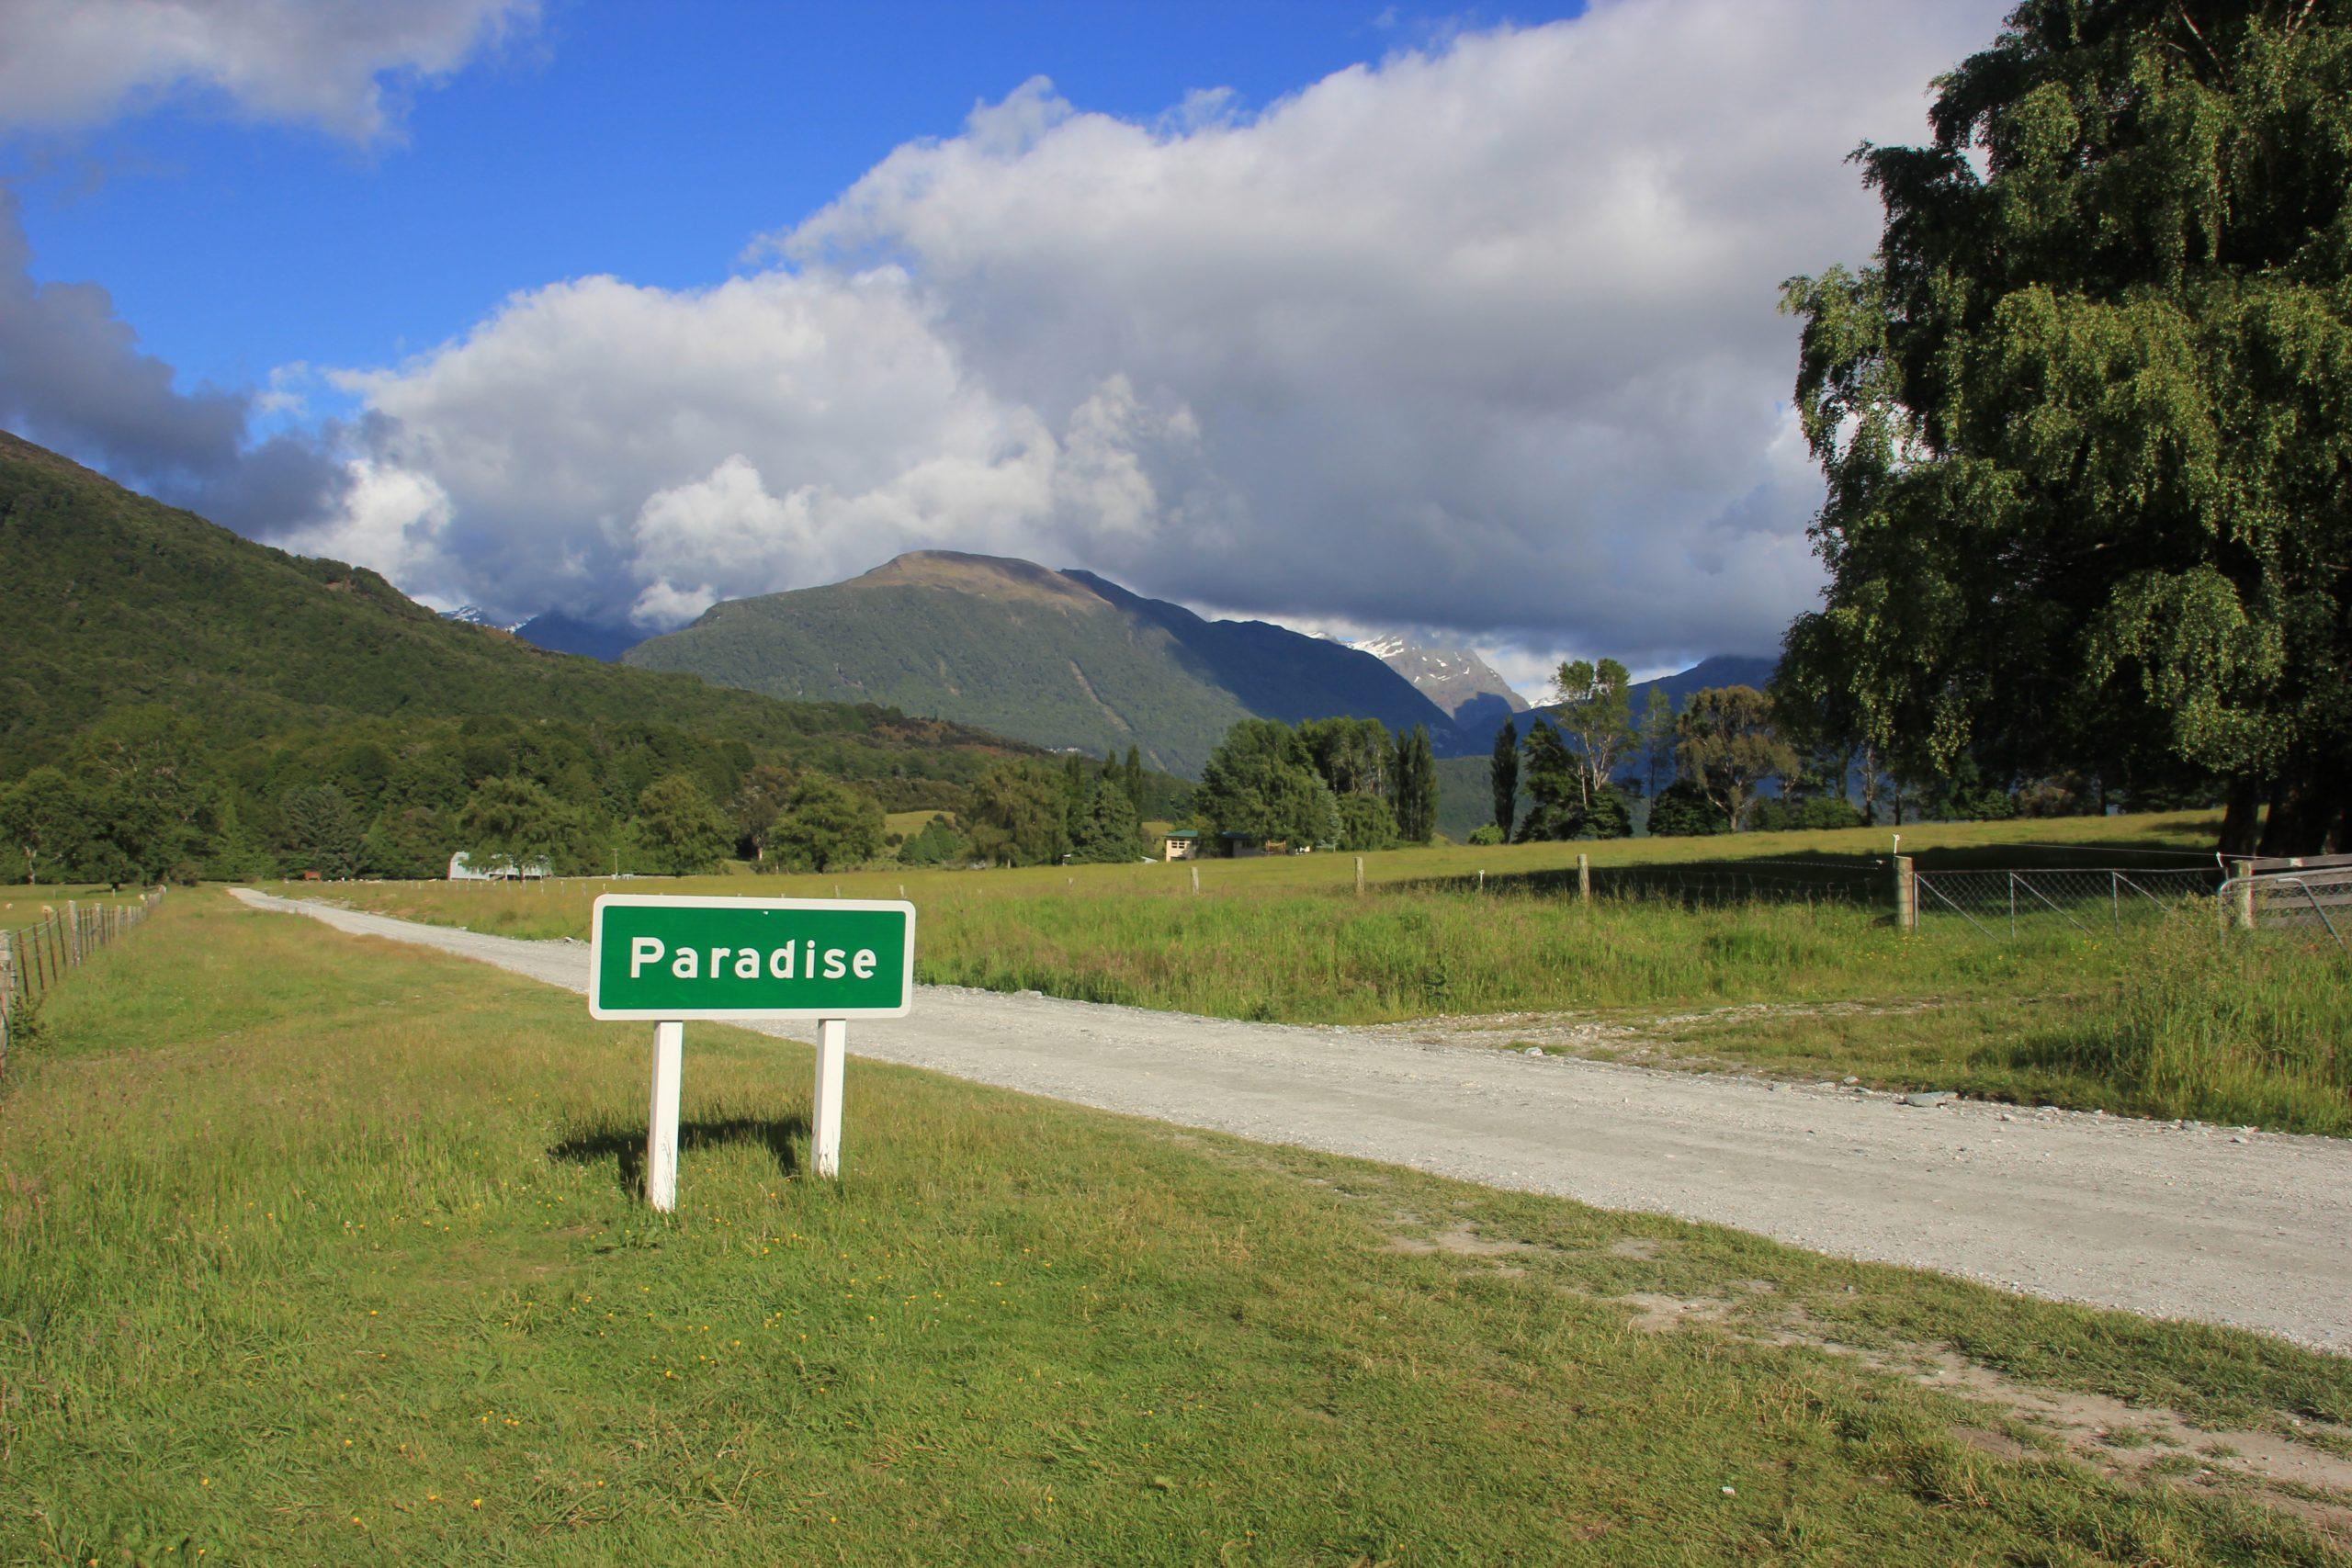 Paradise route Nieuw-Zeeland